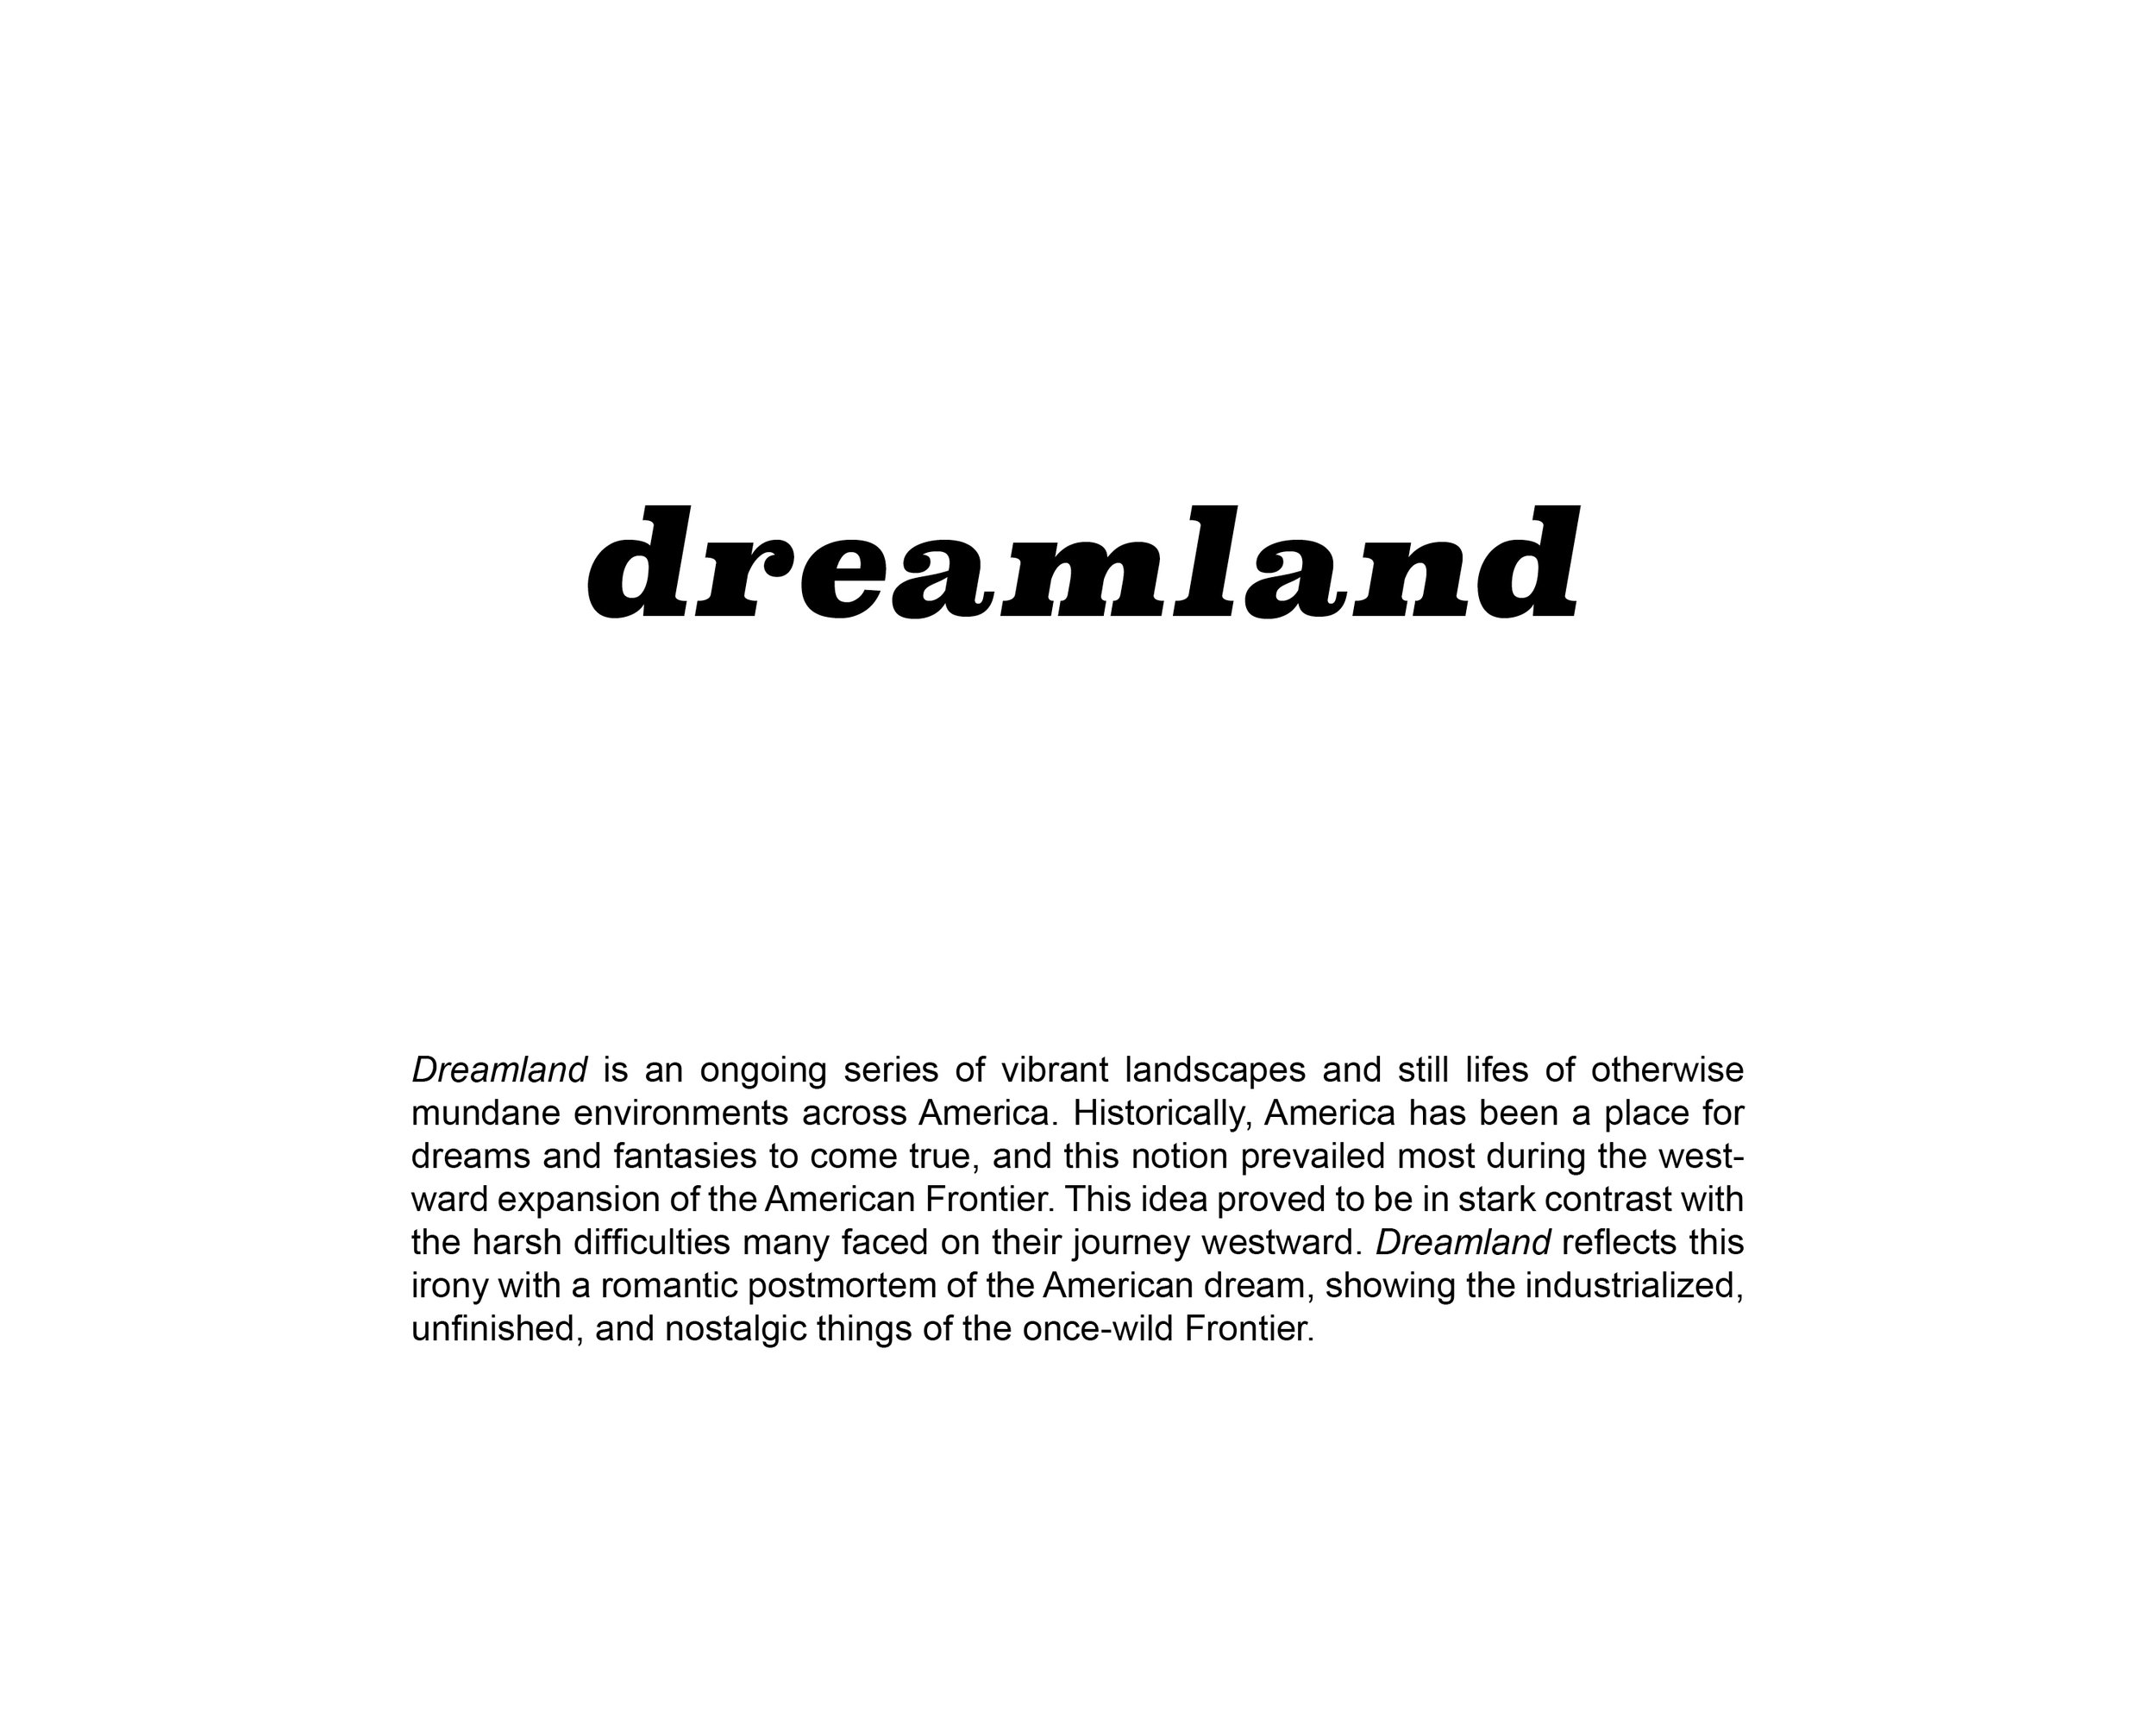 000_Dreamland.jpg